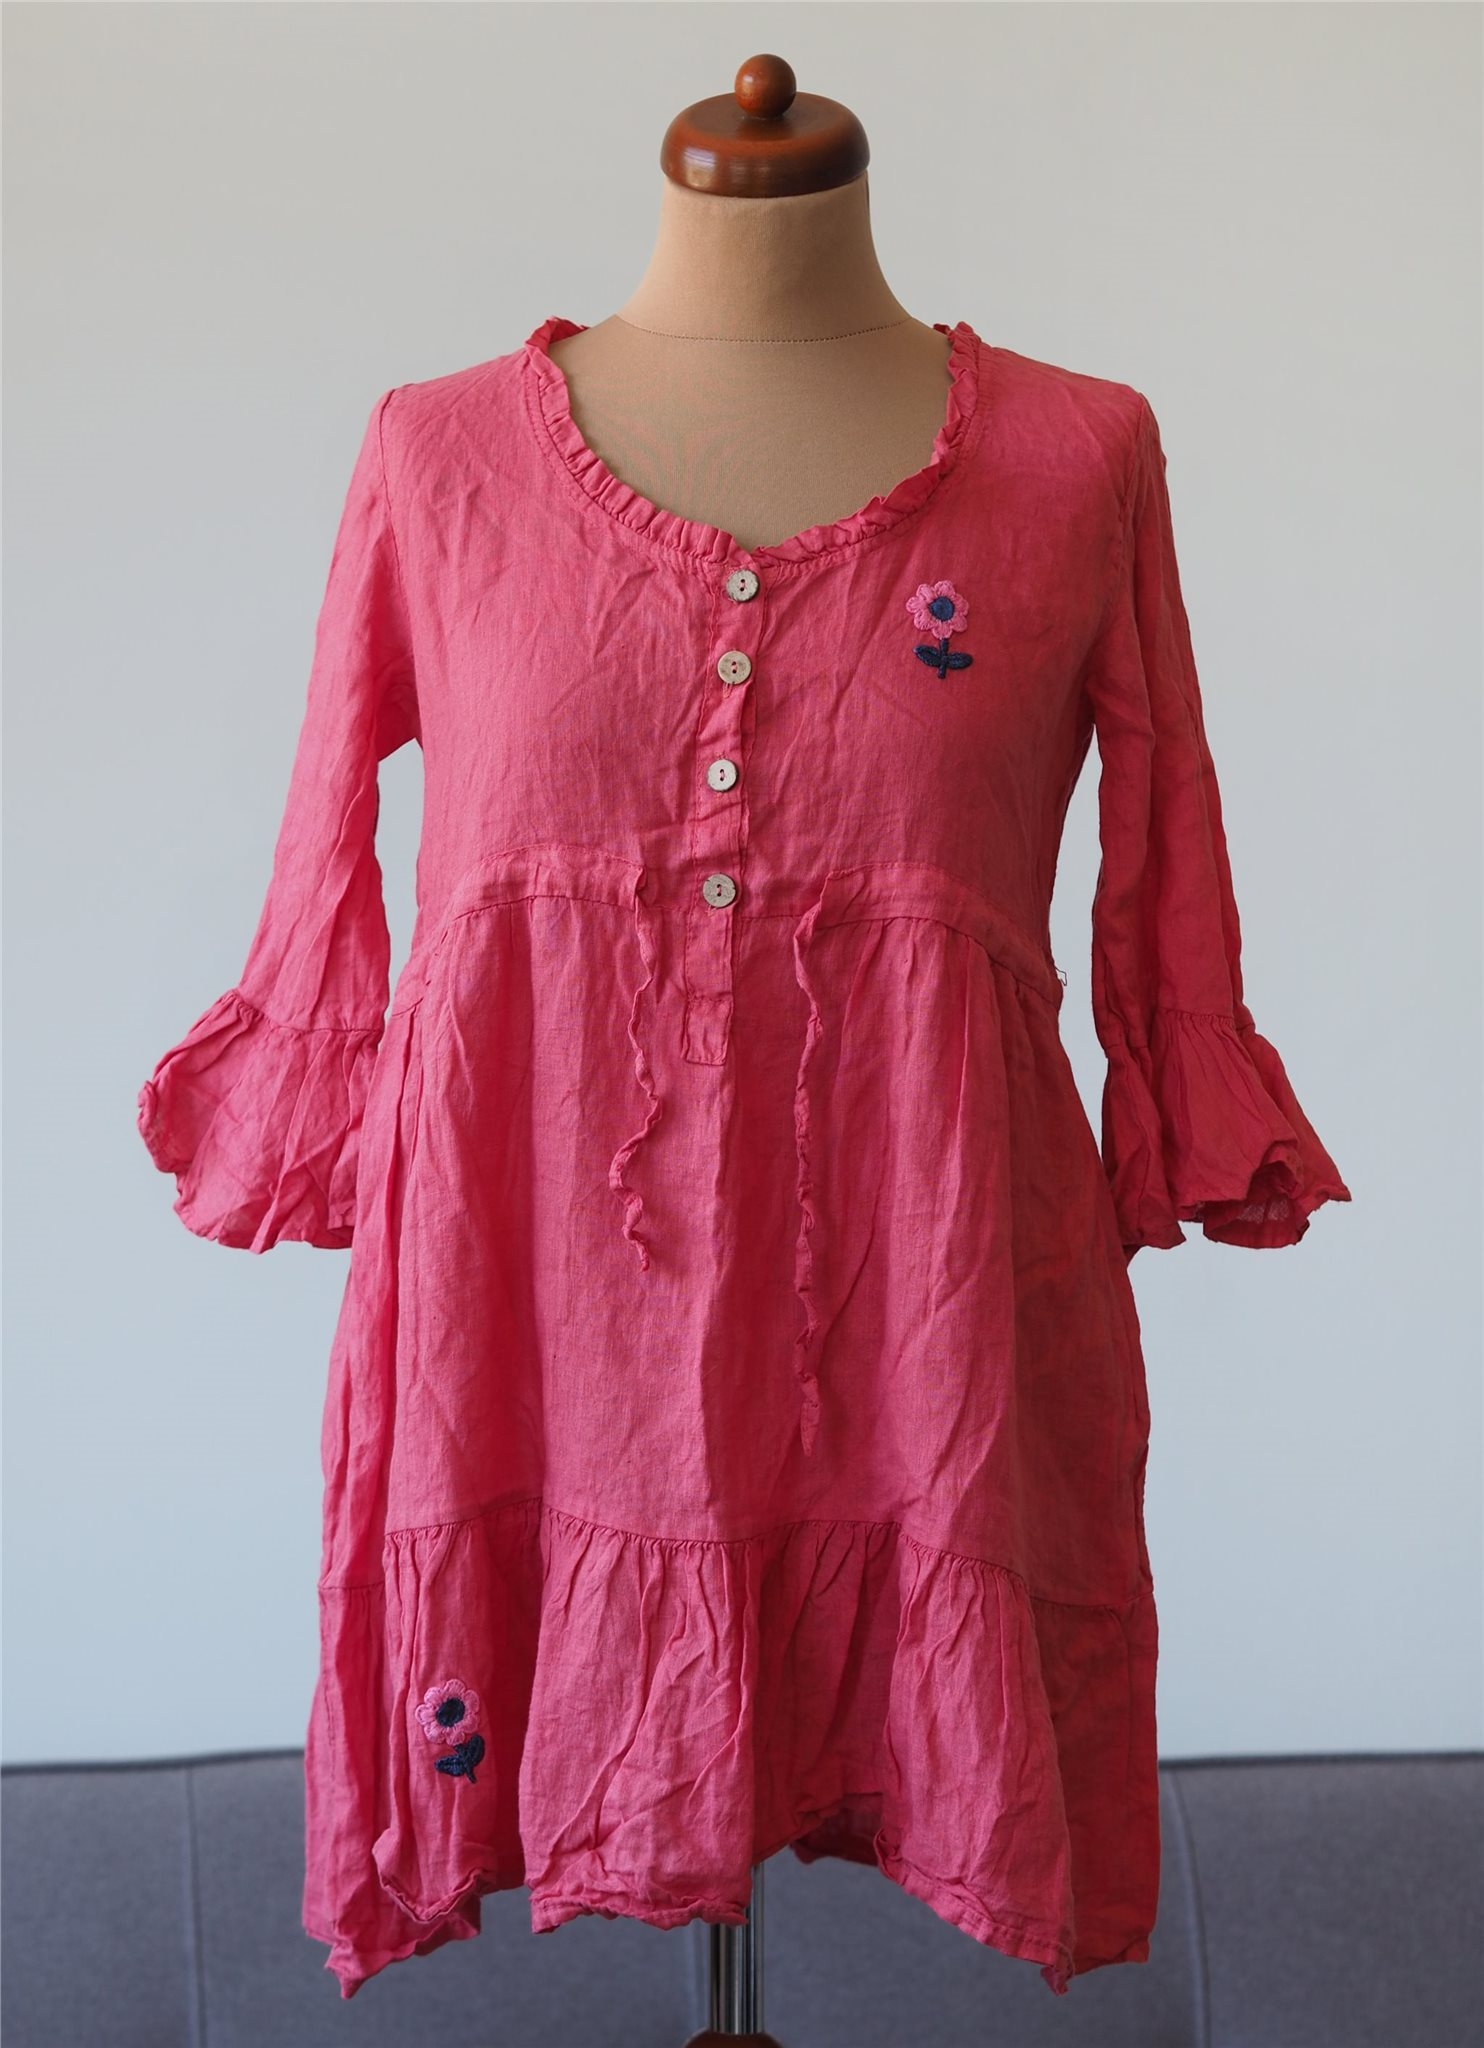 Italienska linne tunika blus linen boho boheme hippie retro romantisk Italy  M L 0e6788682ea7d